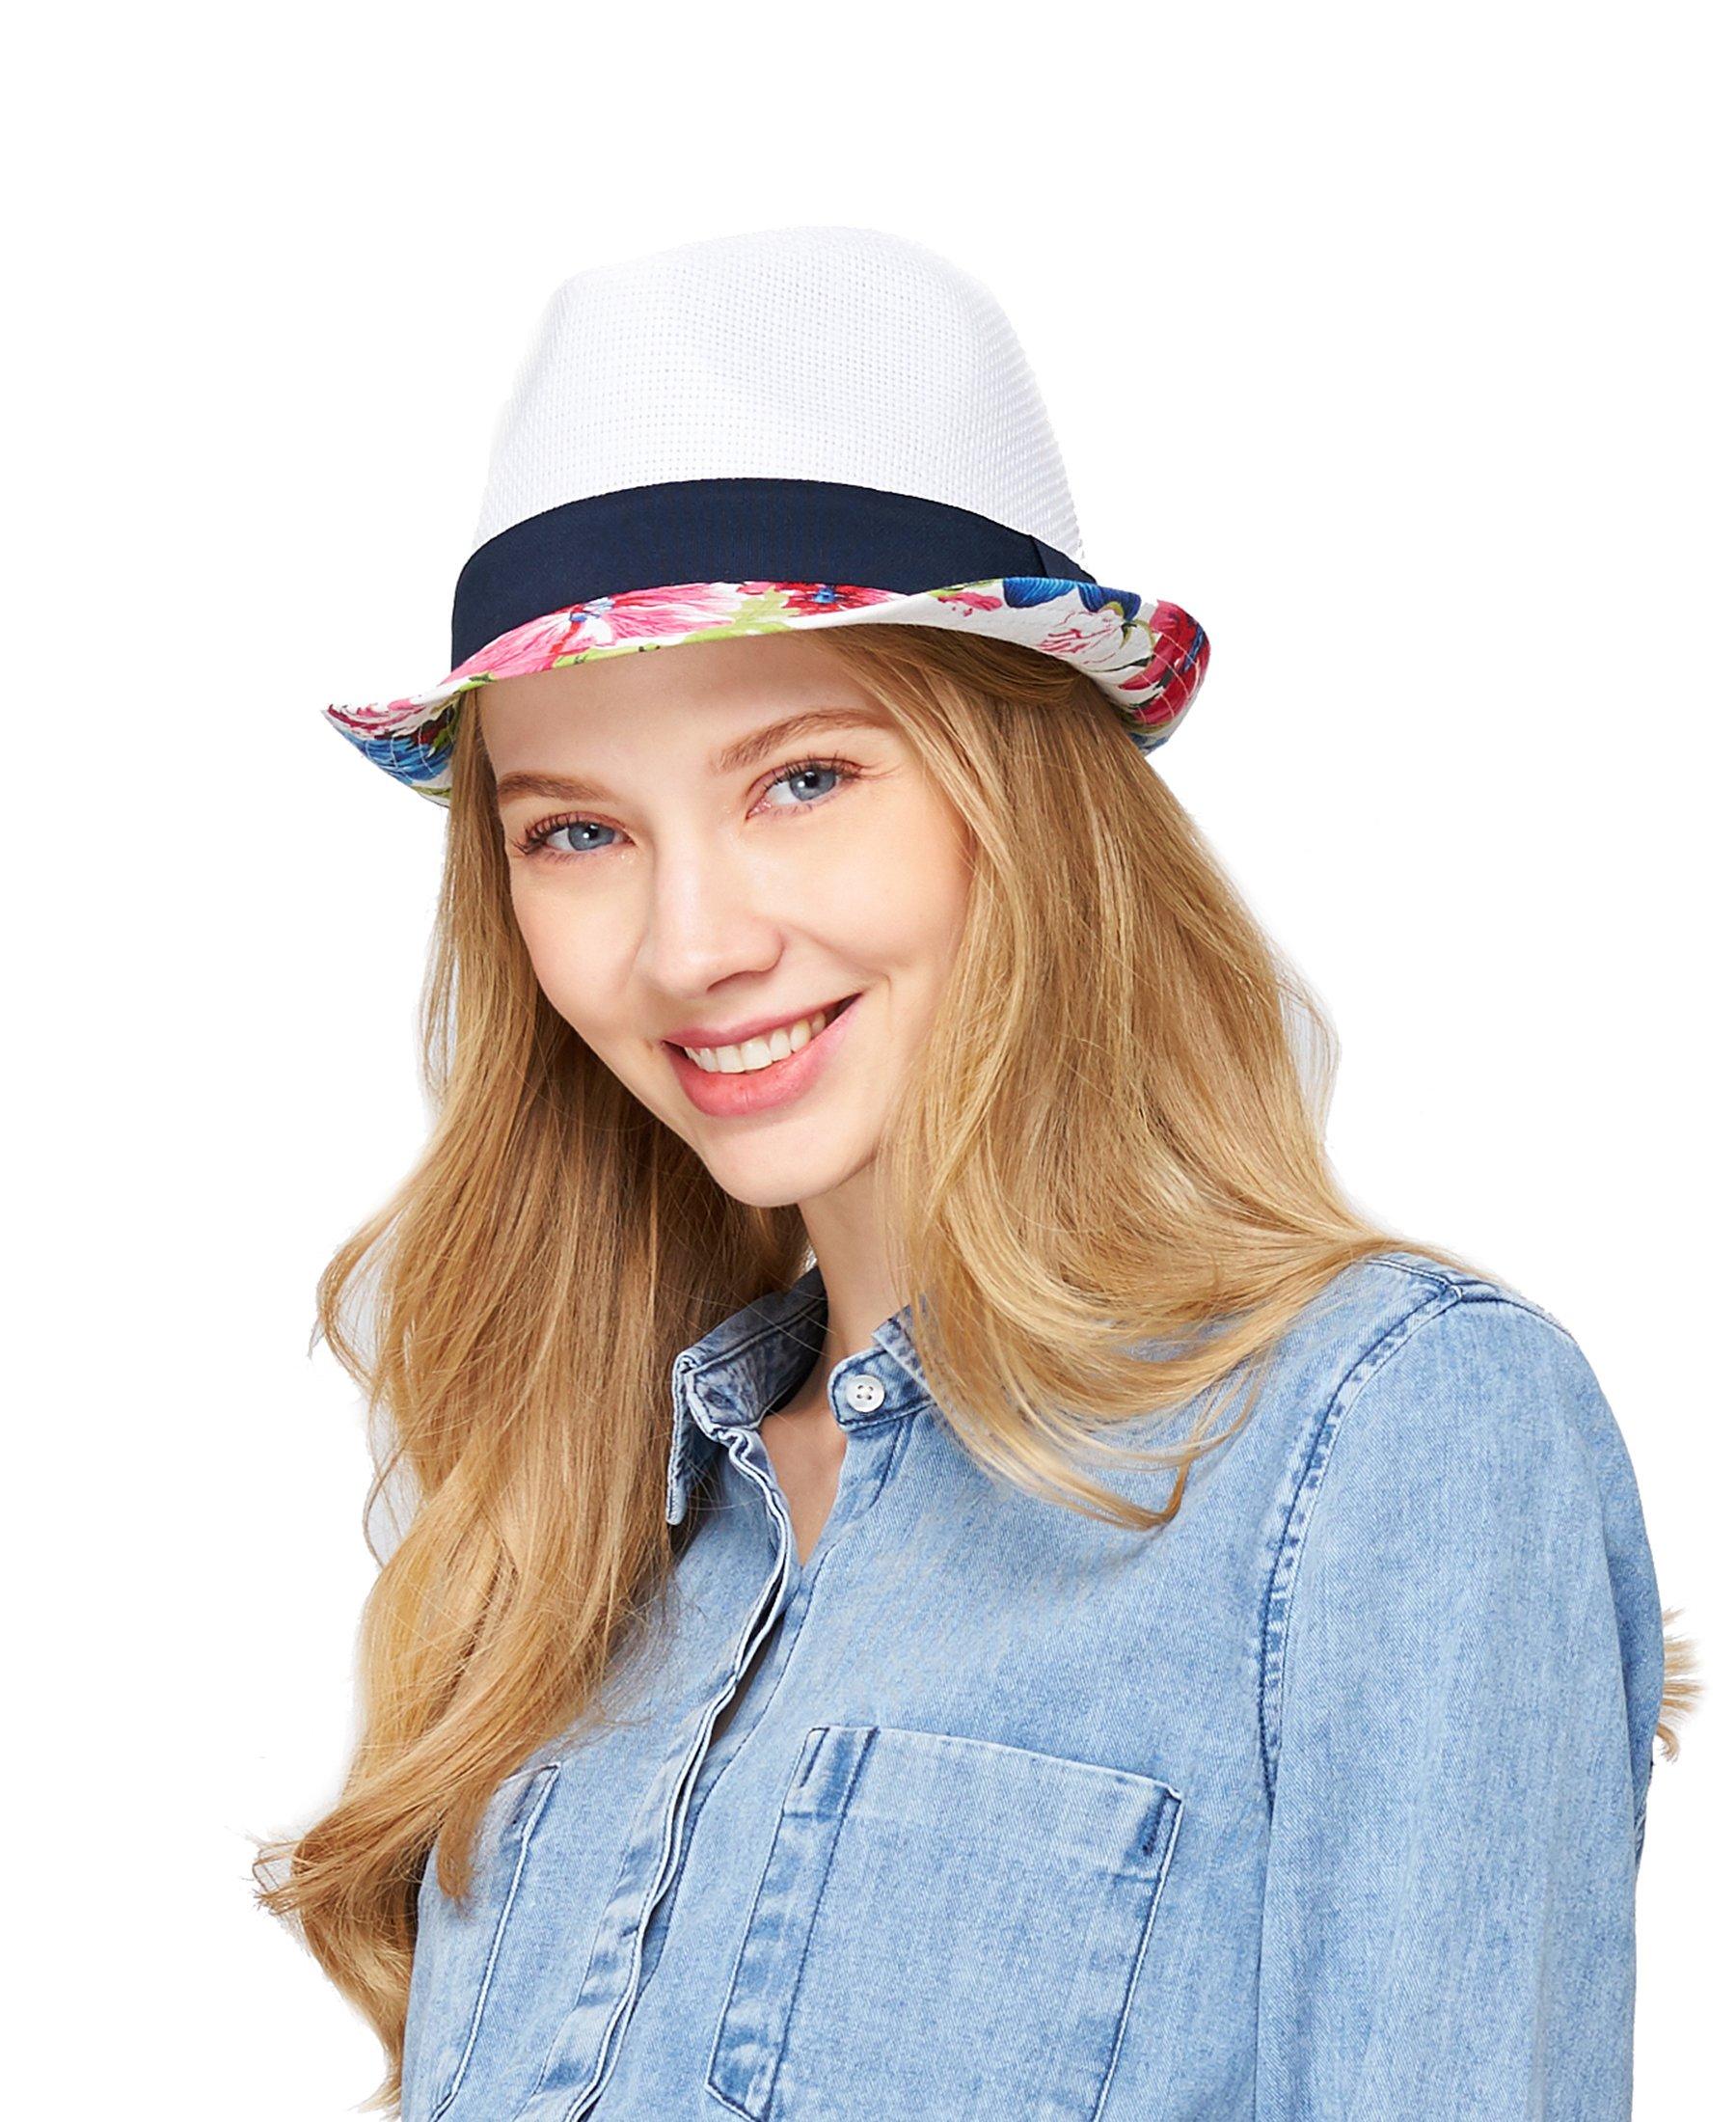 EUPHIE YING Women Men Panama Straw Summer Cotton Fedora Beach Sun Hats Short Brim